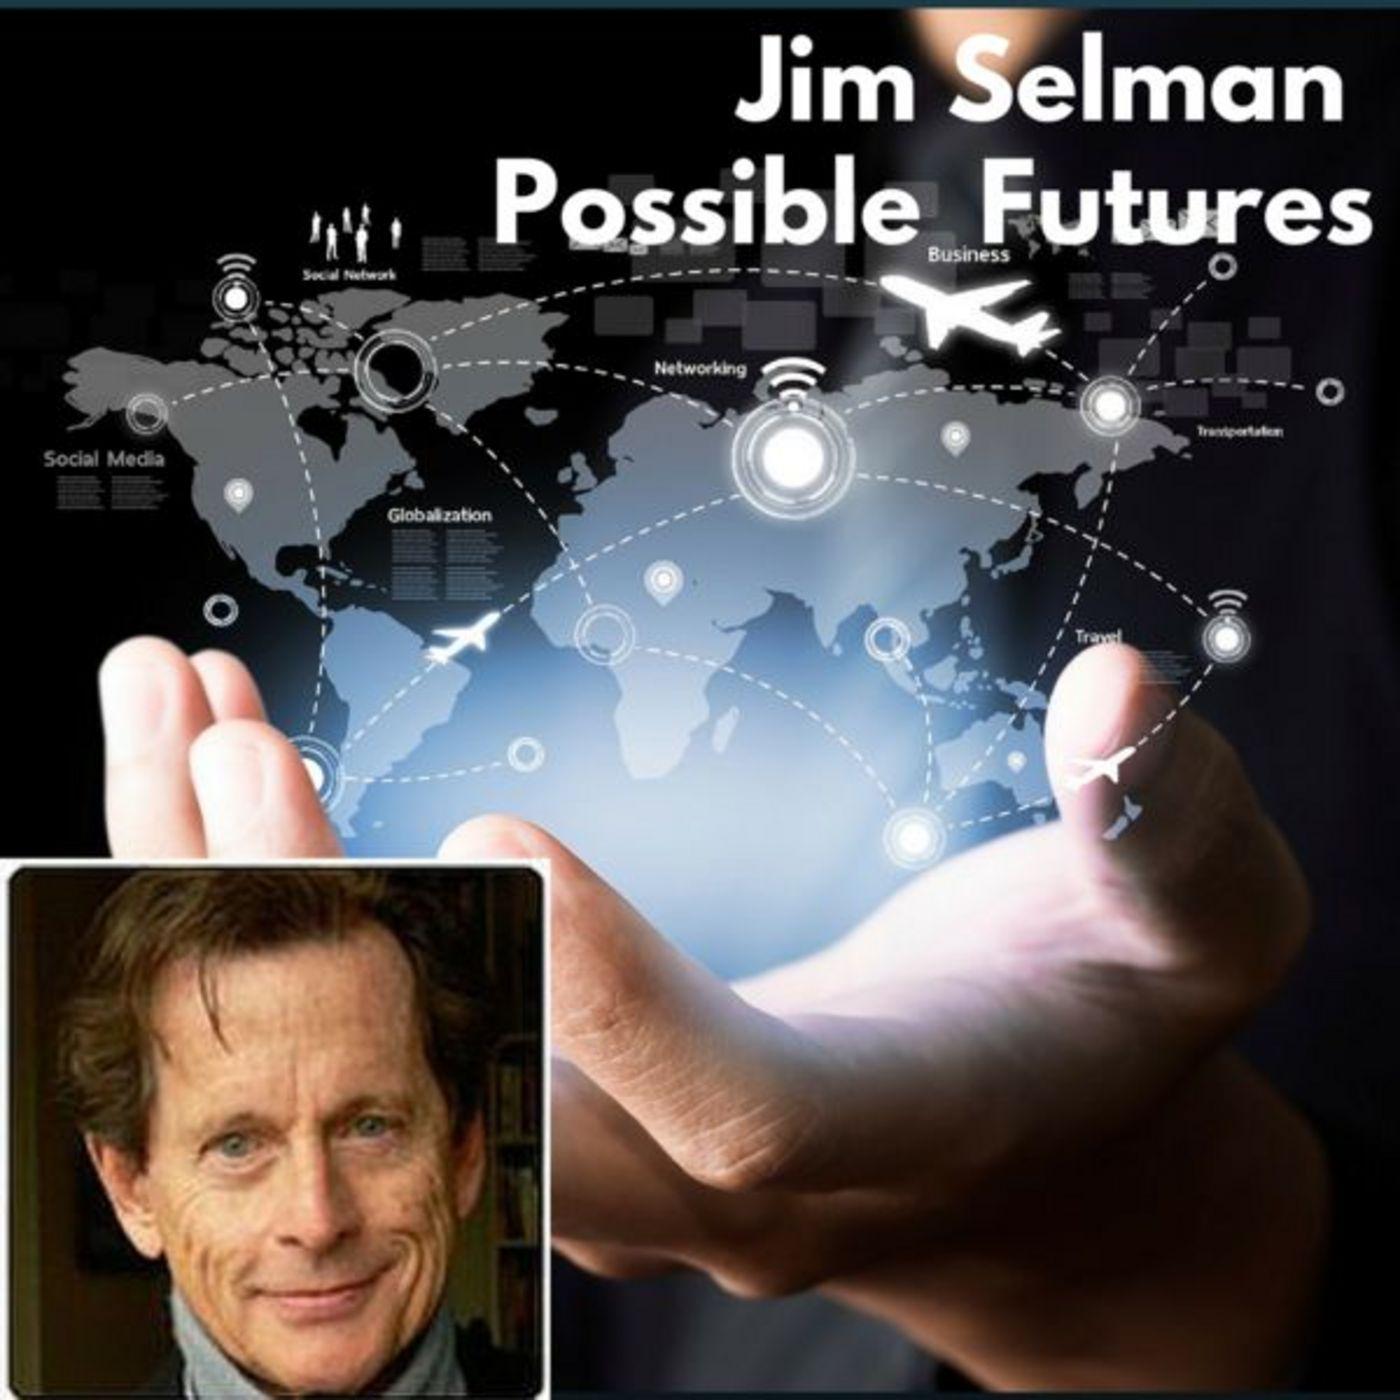 <![CDATA[Jim Selman Possible Futures]]>